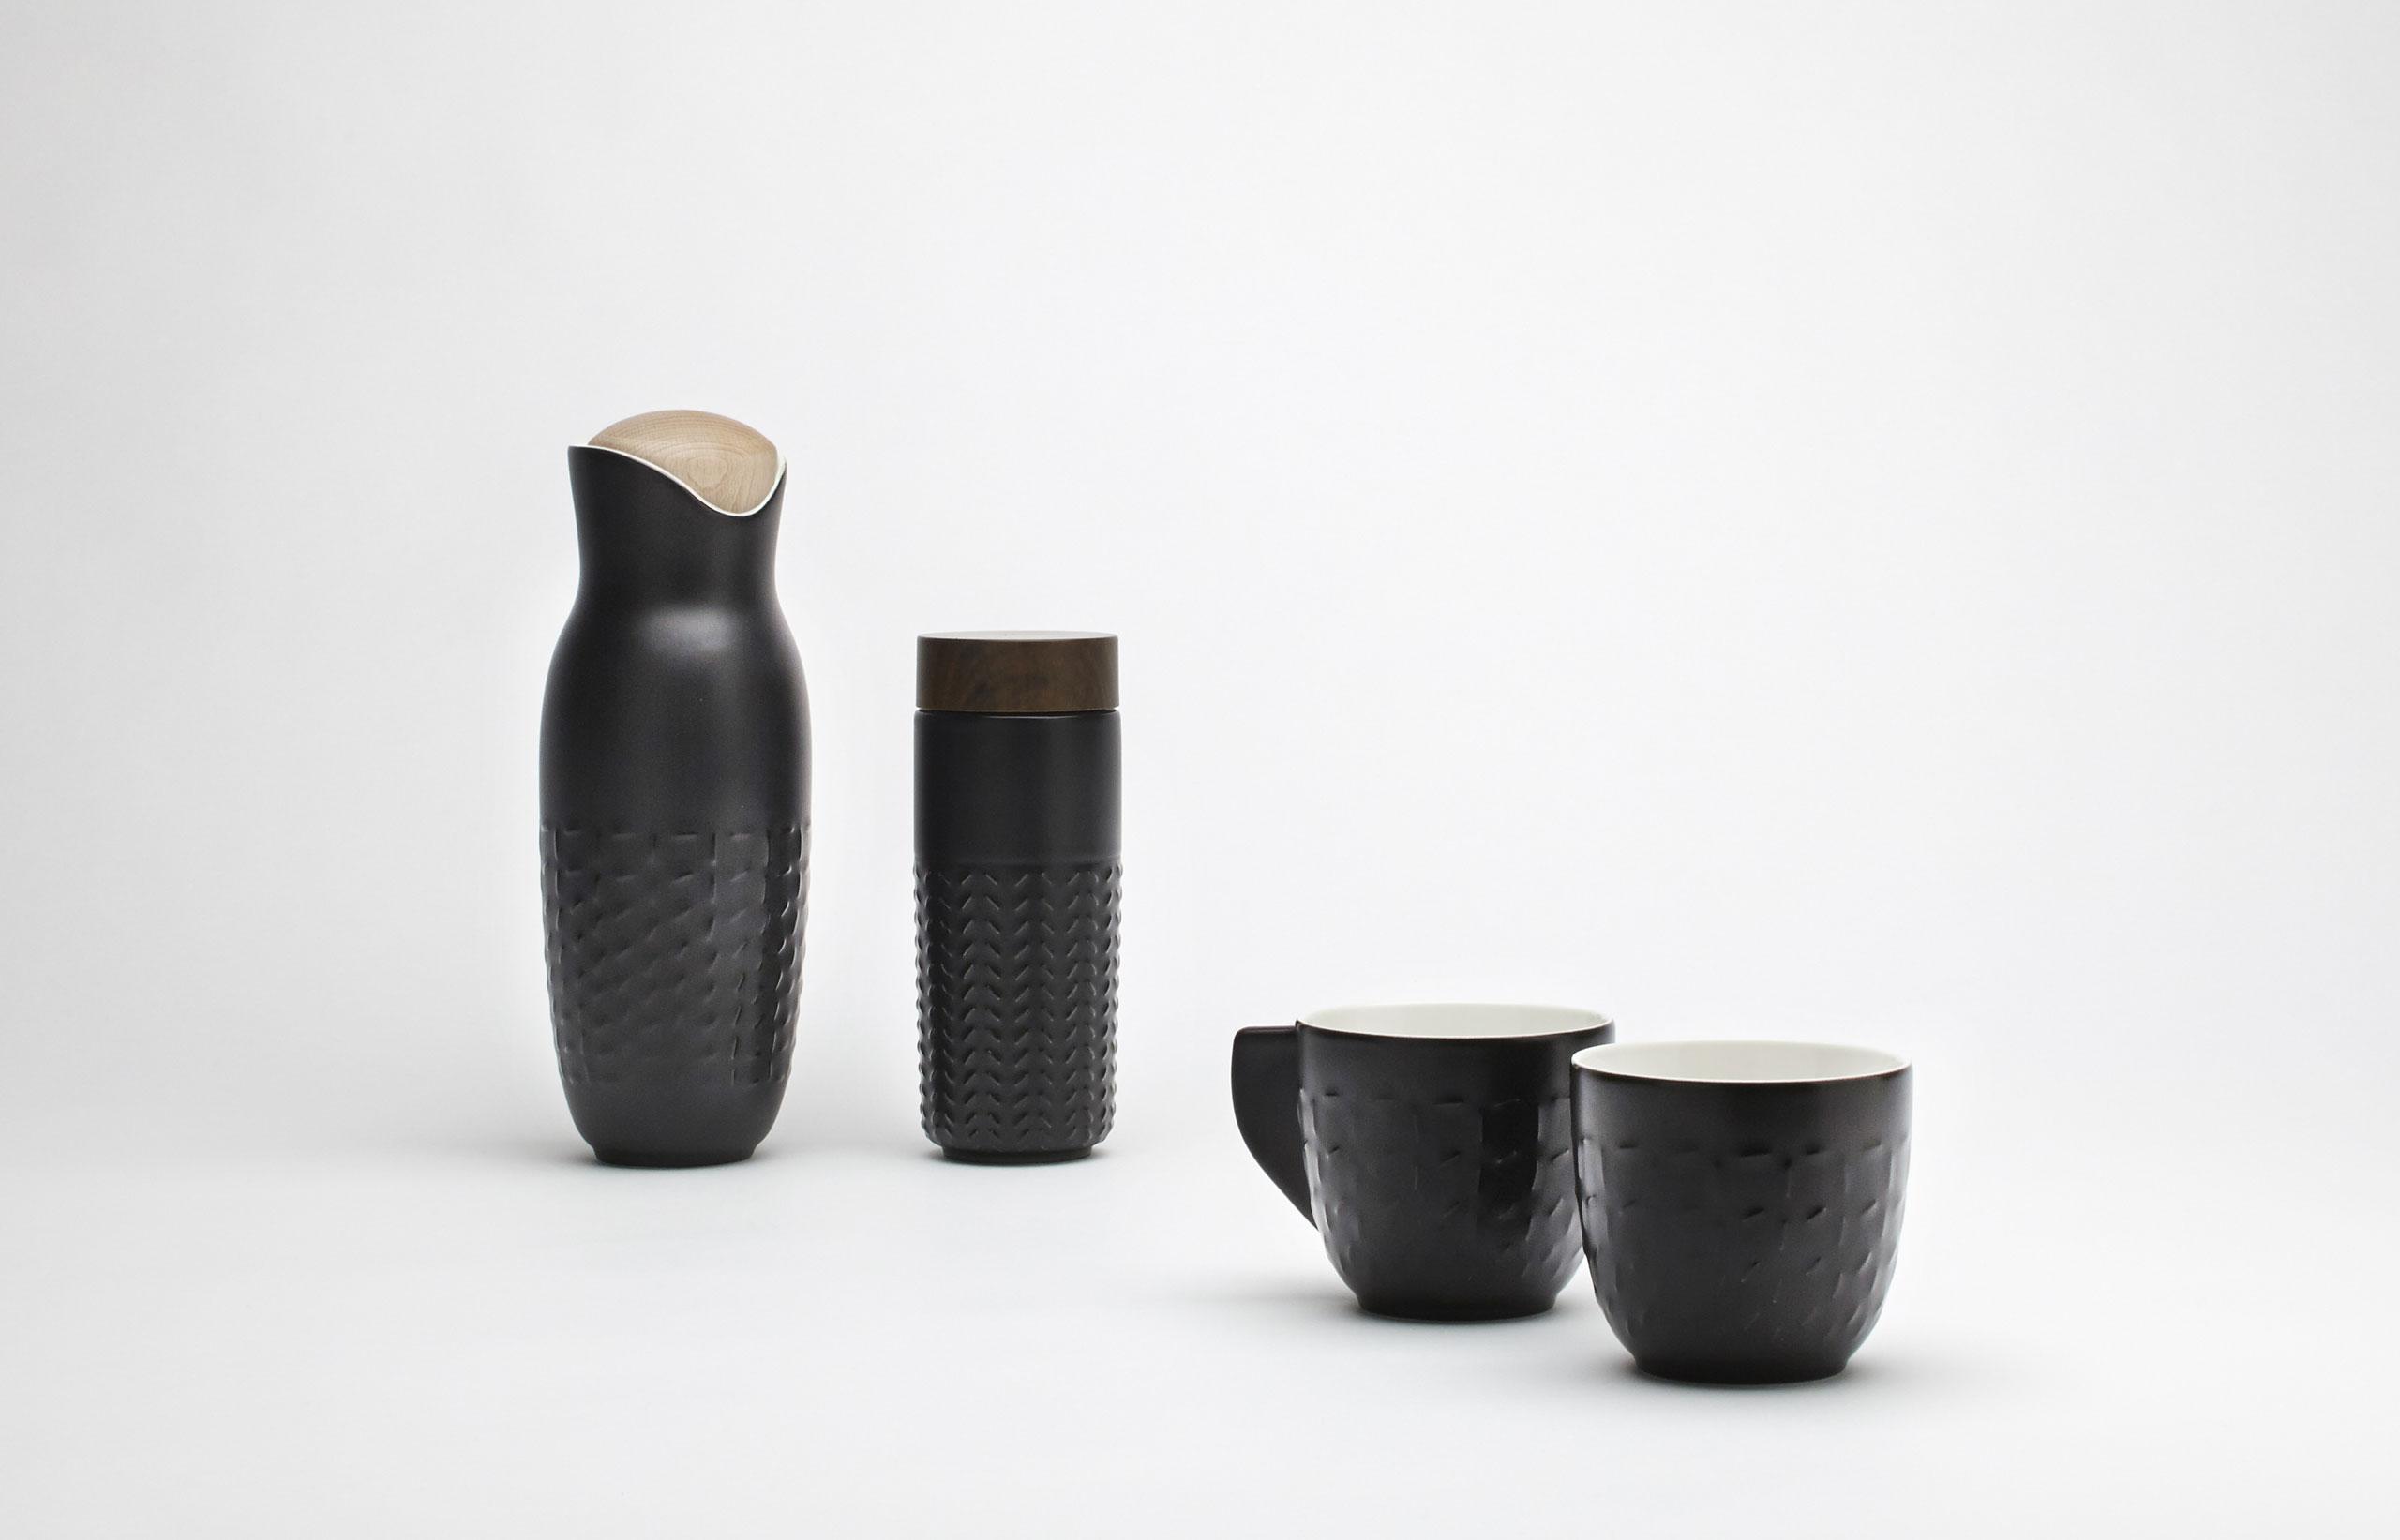 Urban Collection of ceramic tablewareby Hangar Design Group for ACERA.